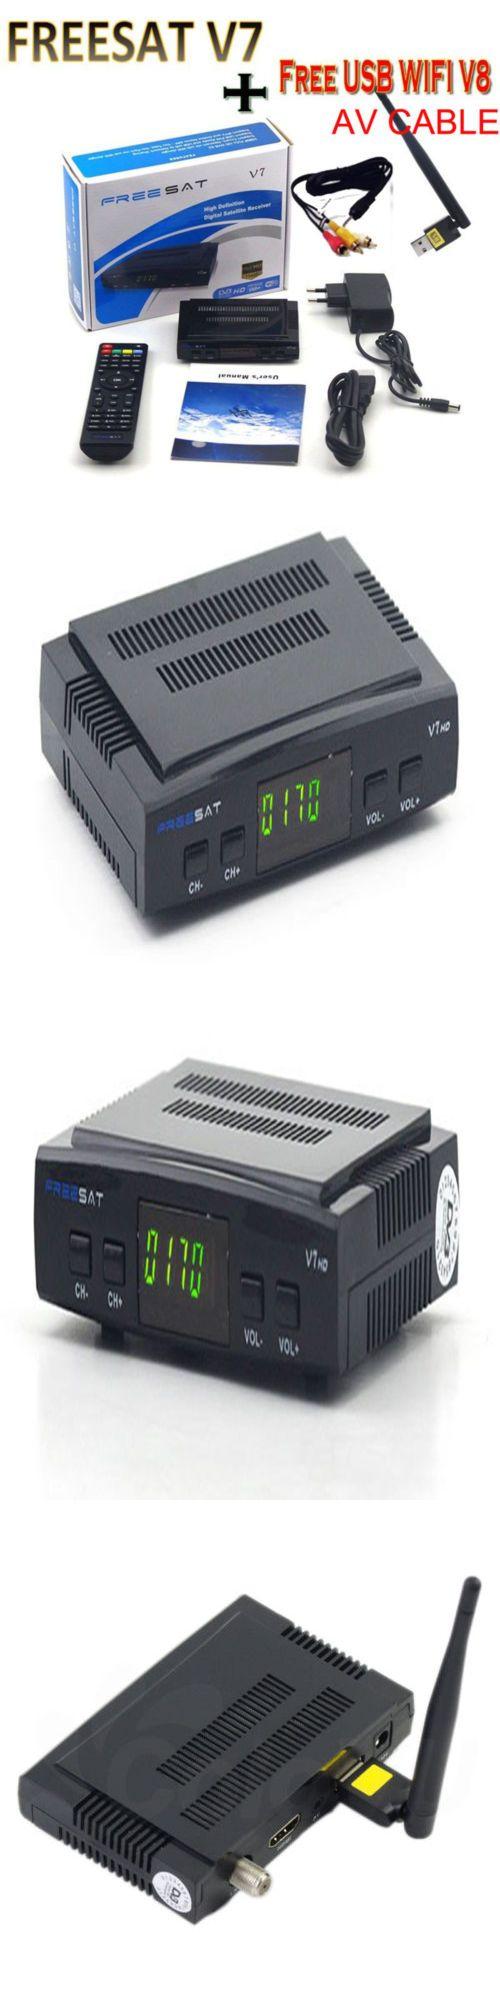 Satellite TV Receivers: Freesat V7 Hd Satellite Receiver Full 1080P+Usb Wifi Dvb-S2 Hd Support Powervu -> BUY IT NOW ONLY: $33.24 on eBay!